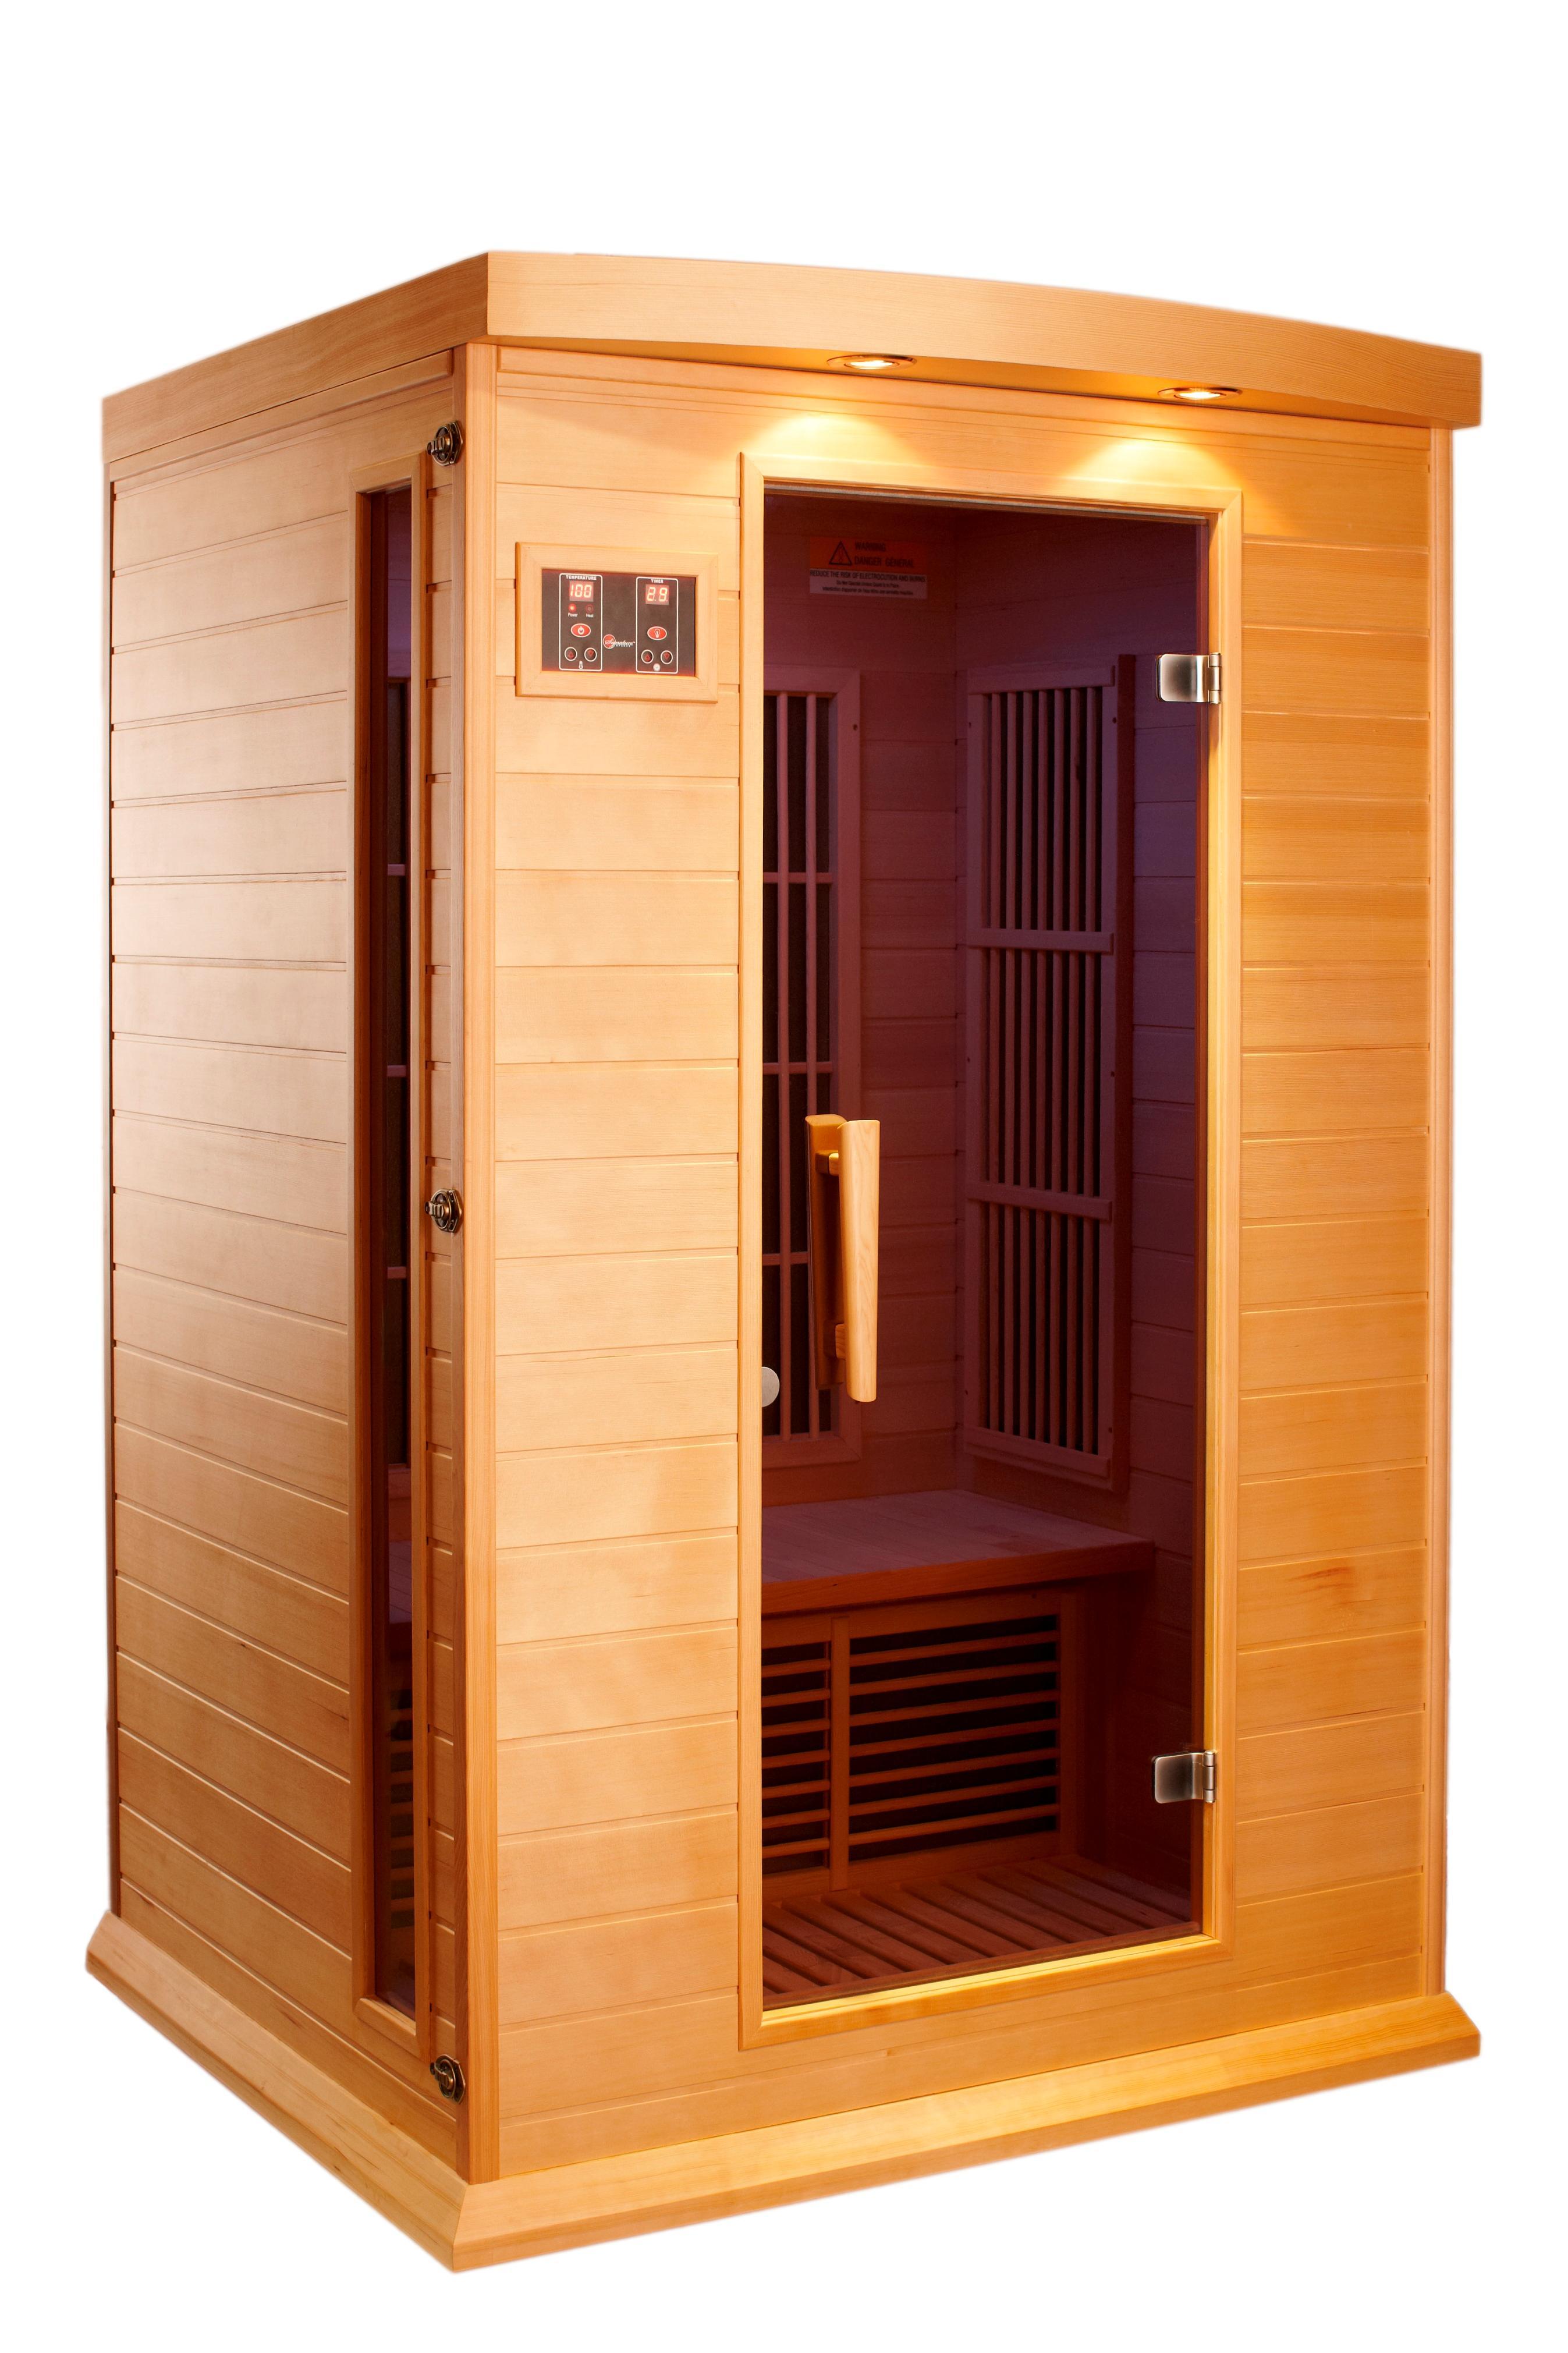 dynamic saunas amz mx k206 01 maxxus toulouse. Black Bedroom Furniture Sets. Home Design Ideas